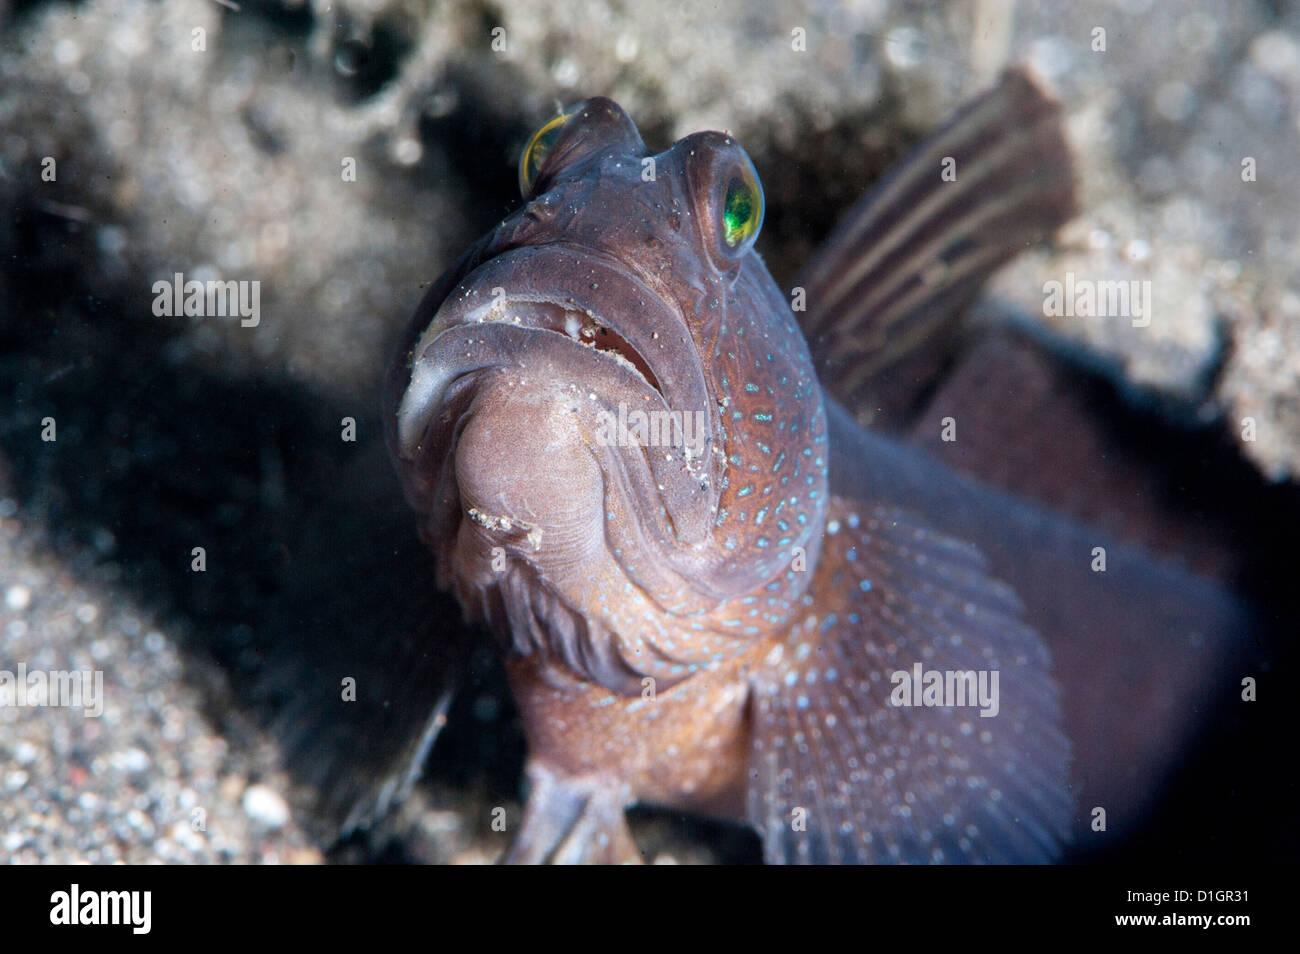 Herrliche Garnelen Grundel (Flabelligobius SP.), Sulawesi, Indonesien, Südostasien, Asien Stockbild